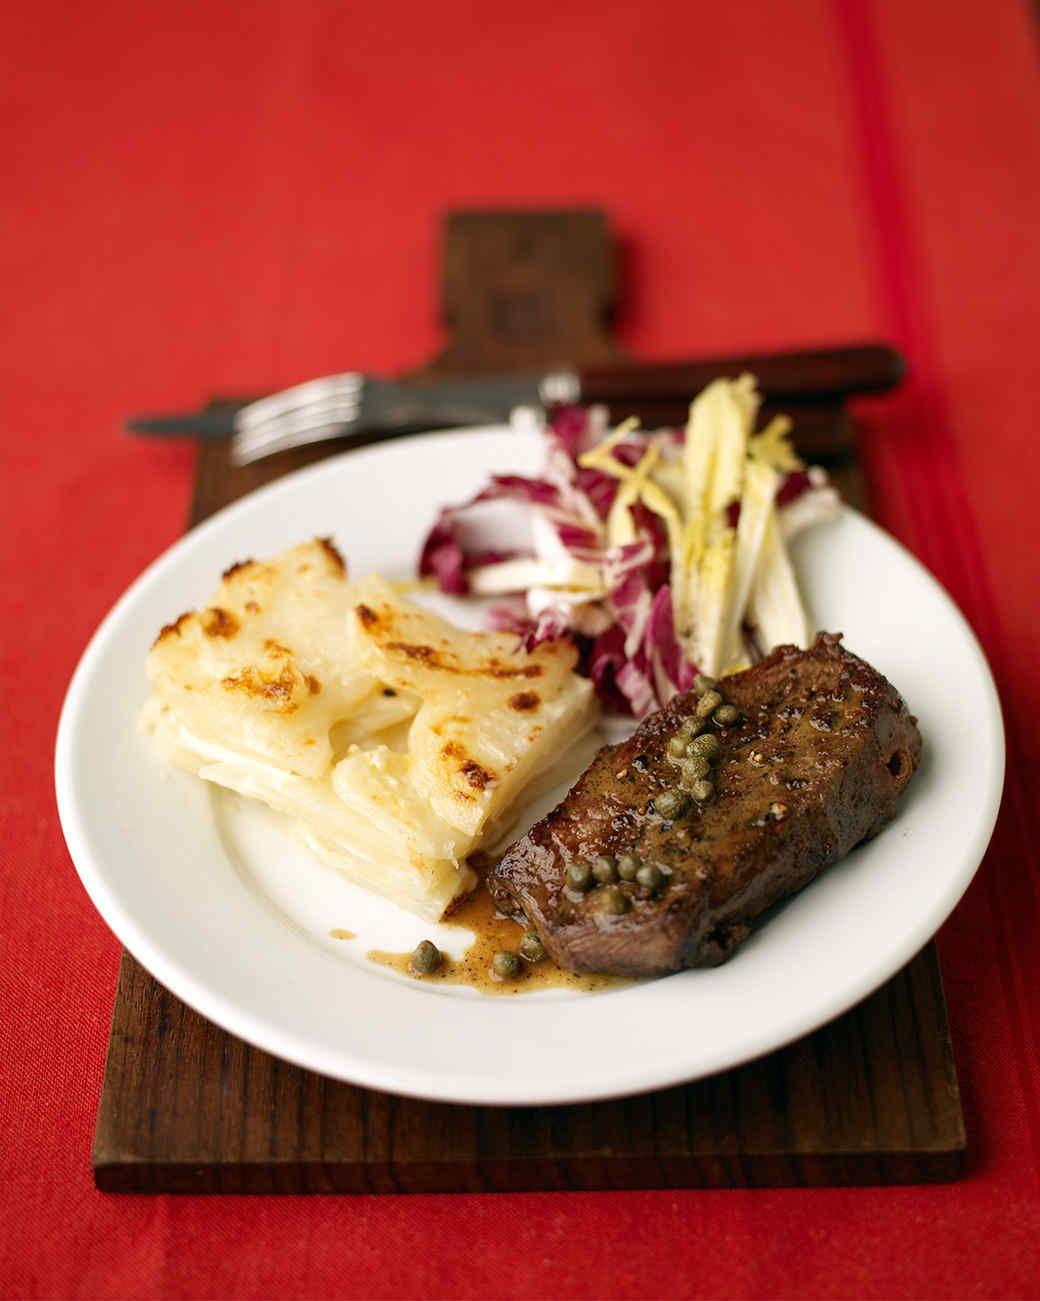 Steak With Wine Sauce And Potato Gratin Recipe Night Dinner Recipes Date Night Recipes Dinner